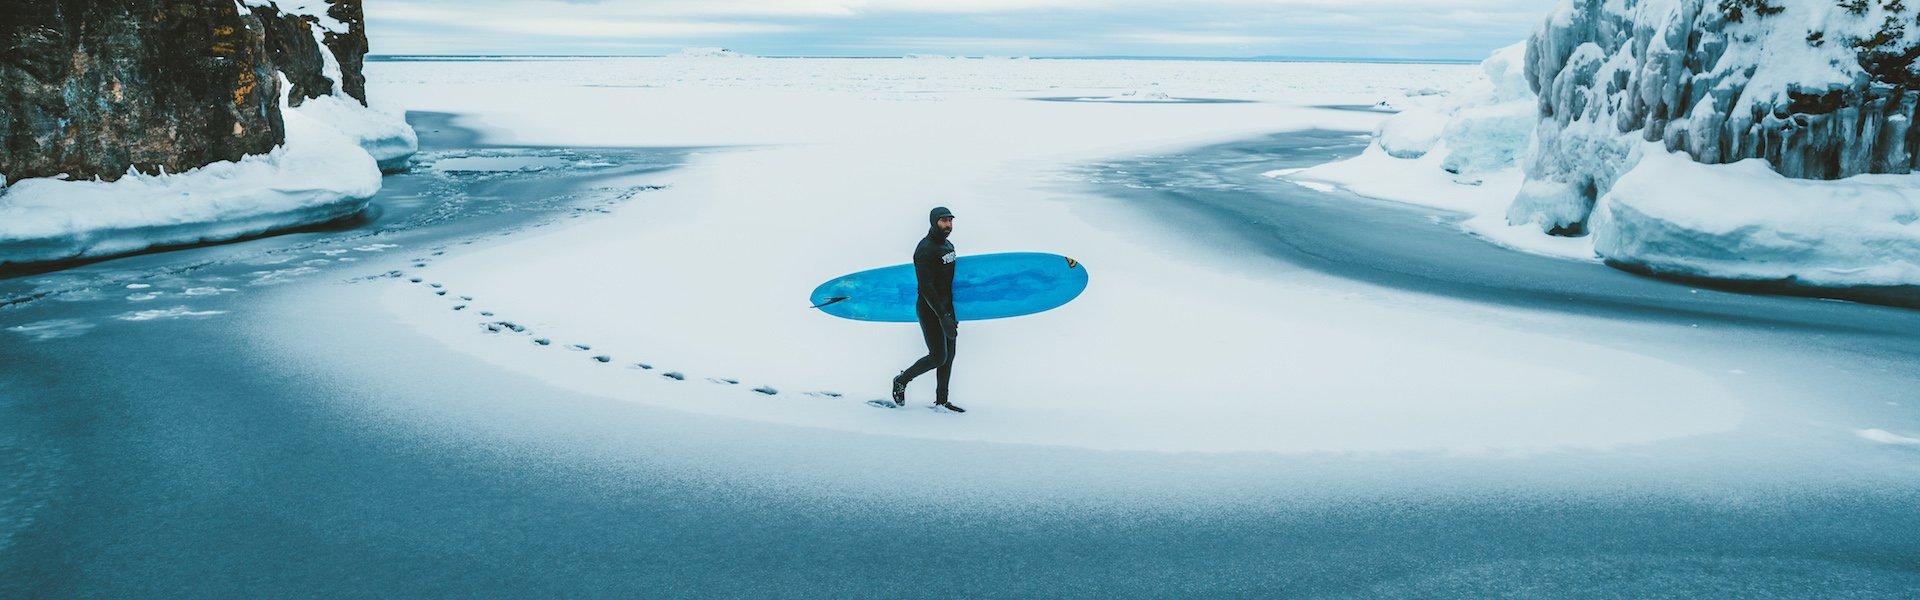 surfer dan vimff 2019 BG